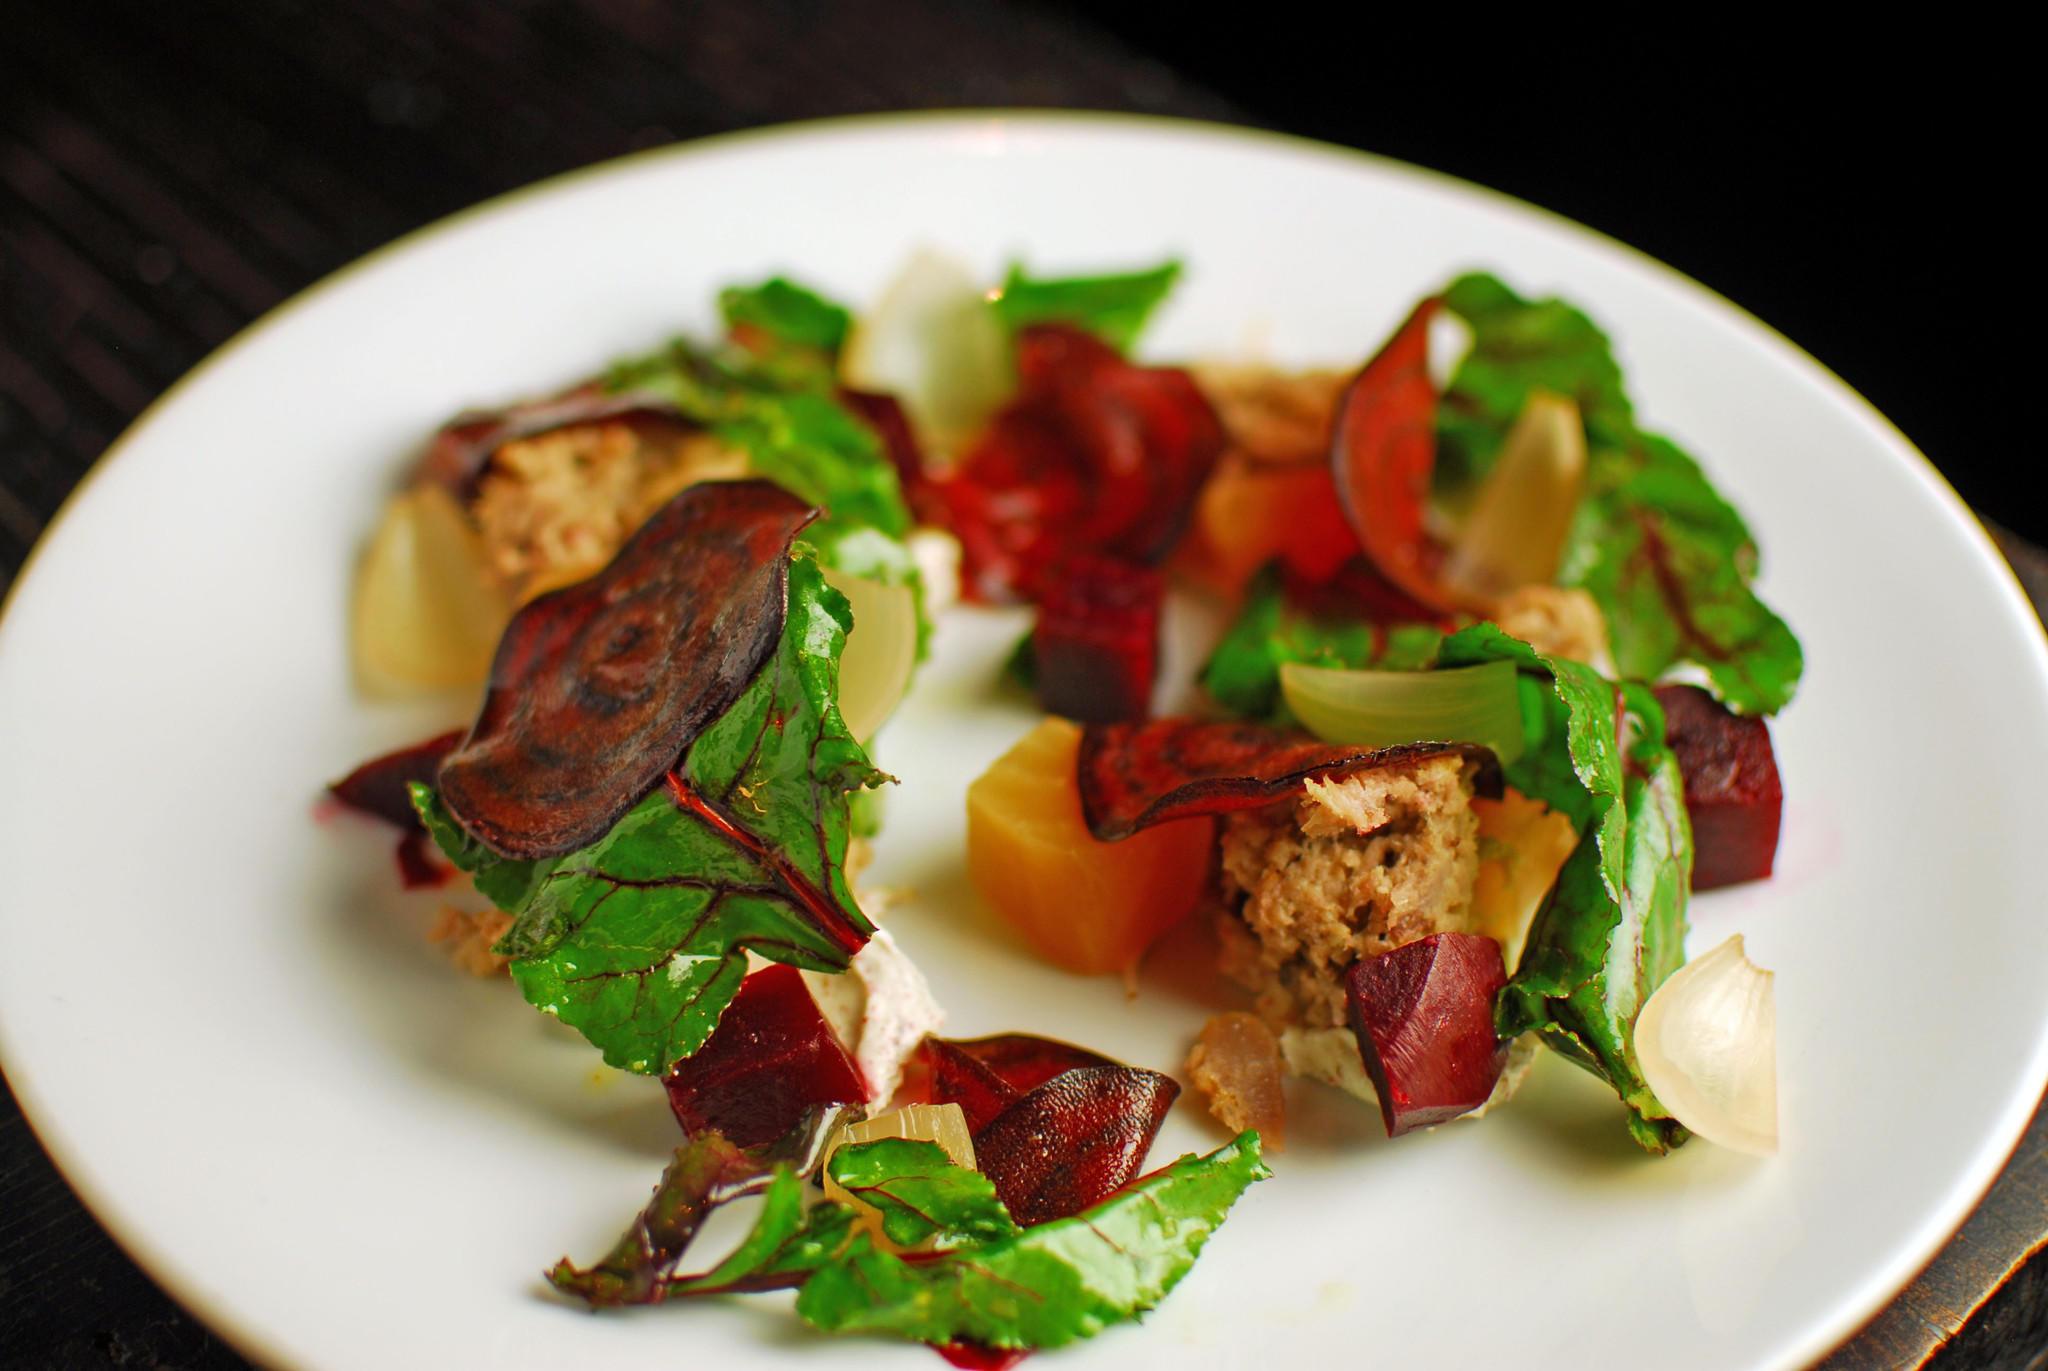 Telegraph's duck confit salad